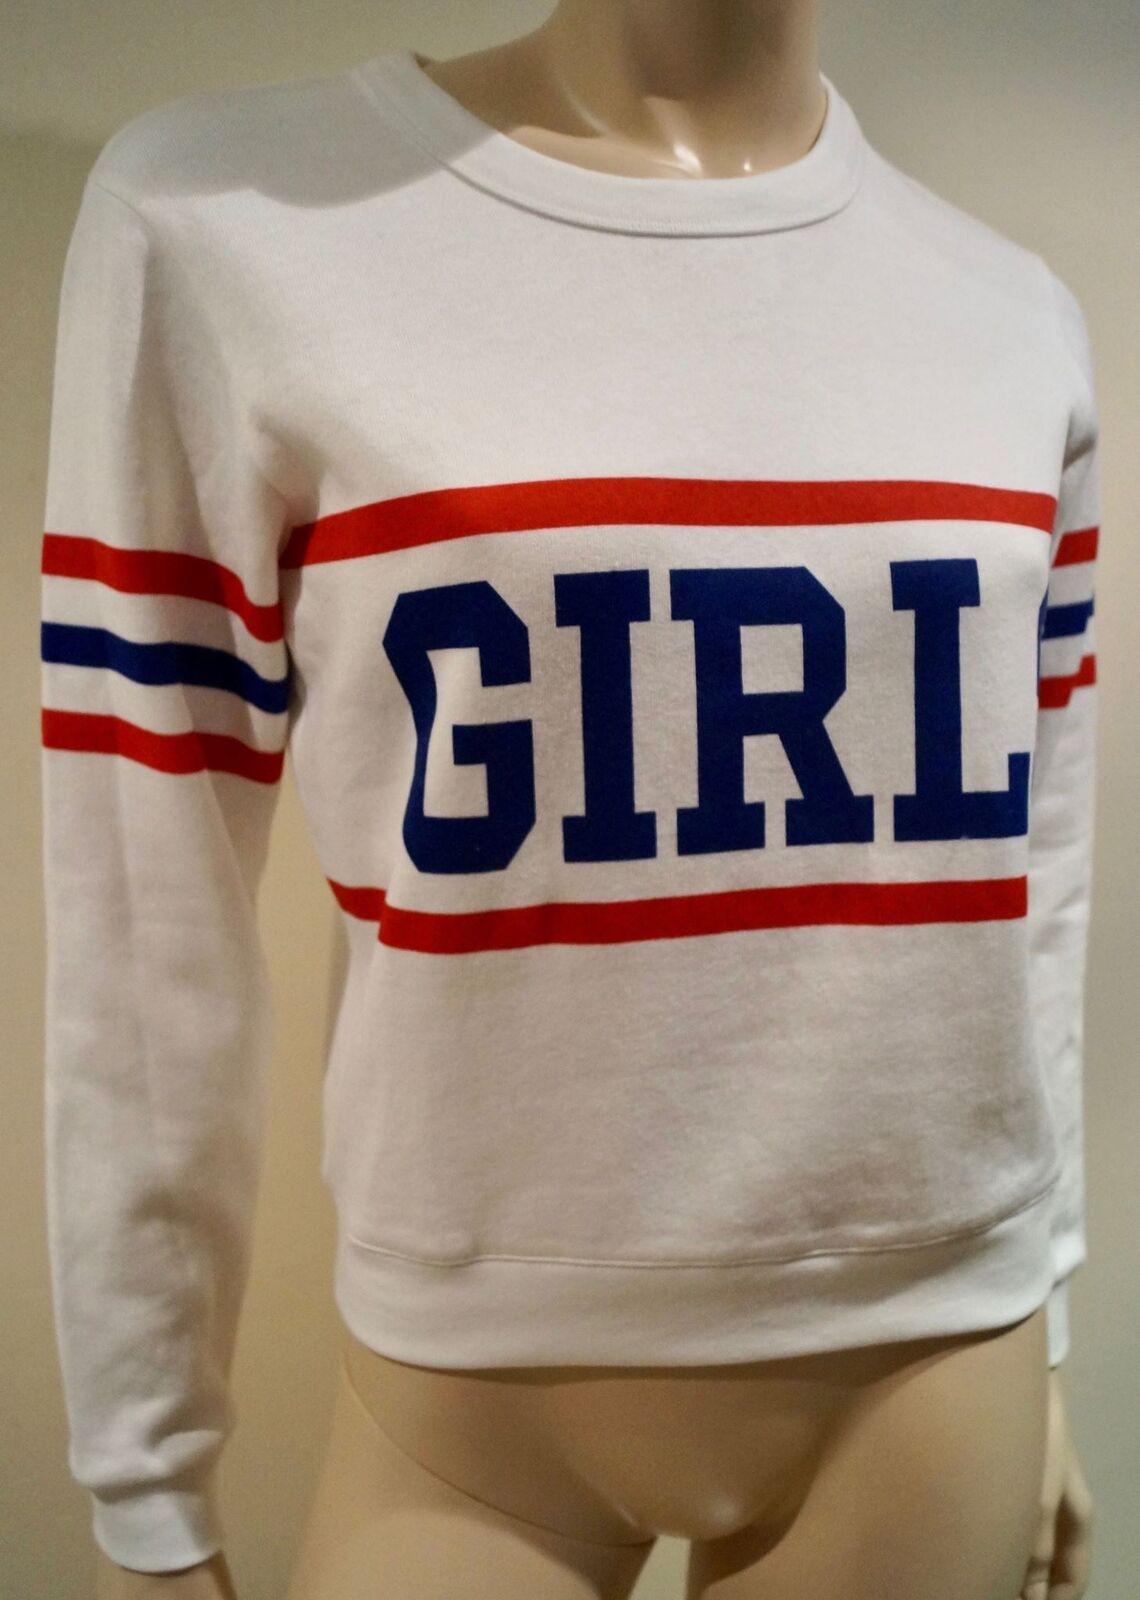 CLAUDIE PIERLOT Women's White Cotton Blend Jersey Sweater Jumper Top T1 UK8 BNWT